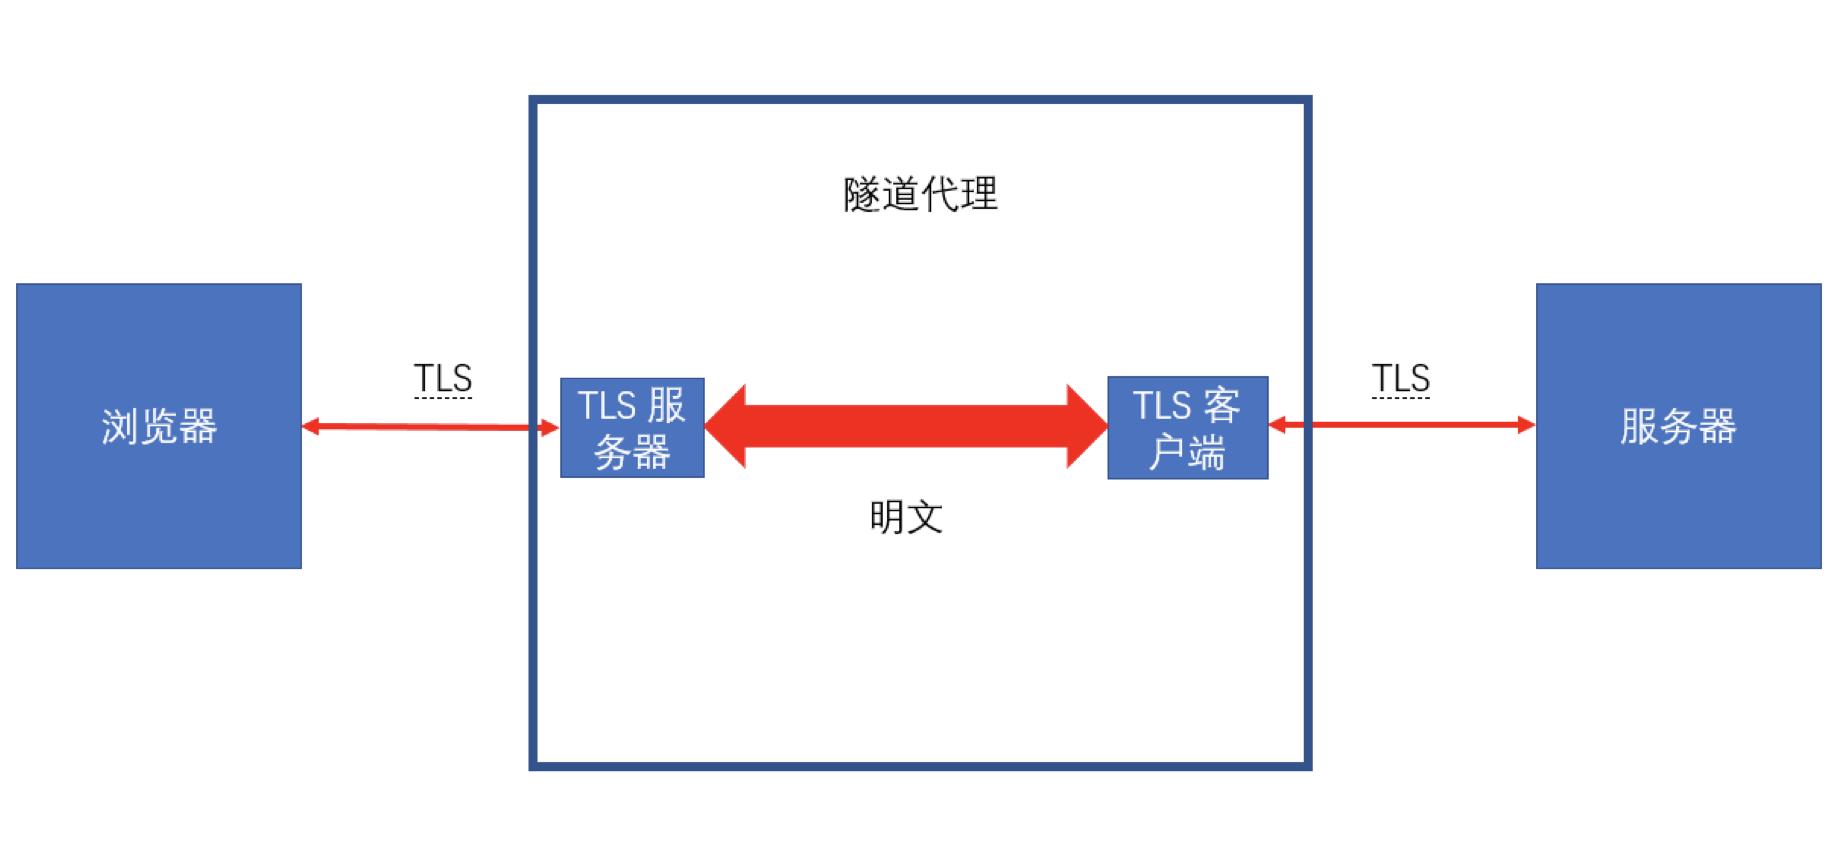 TLS 示意图 2